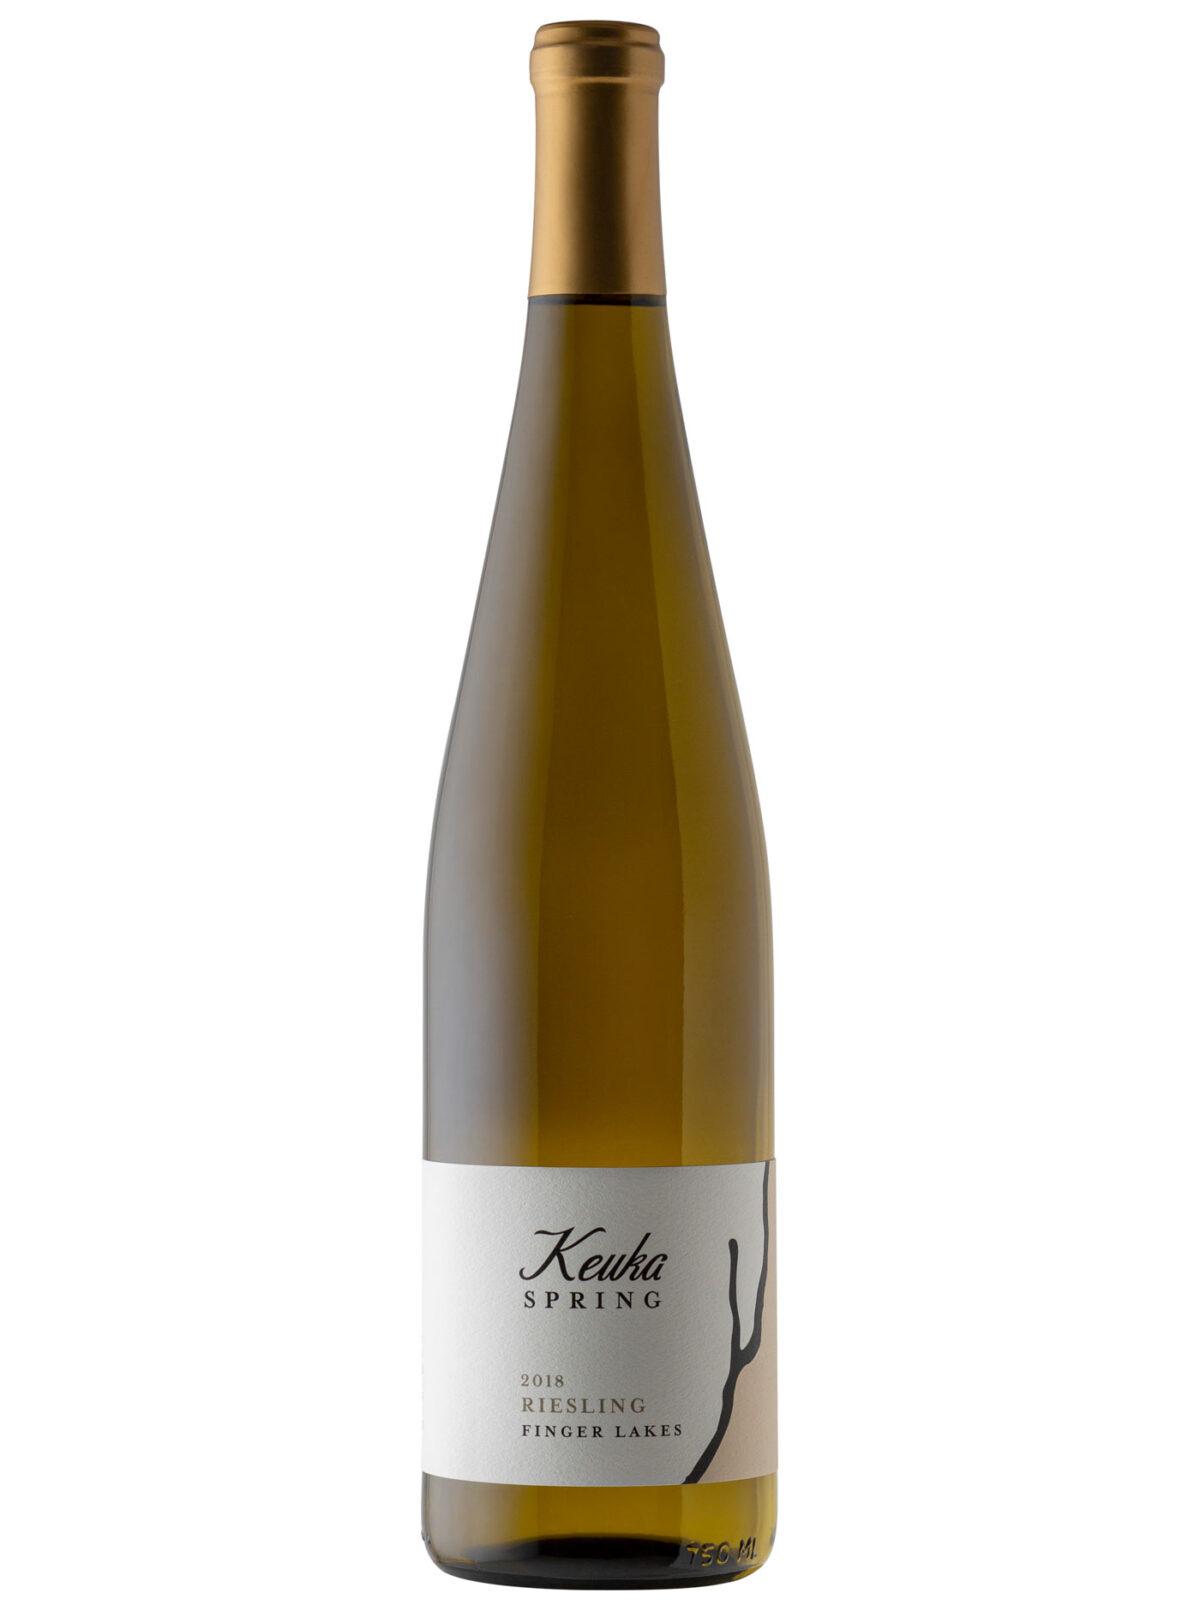 Keuka Springs wine bottle.